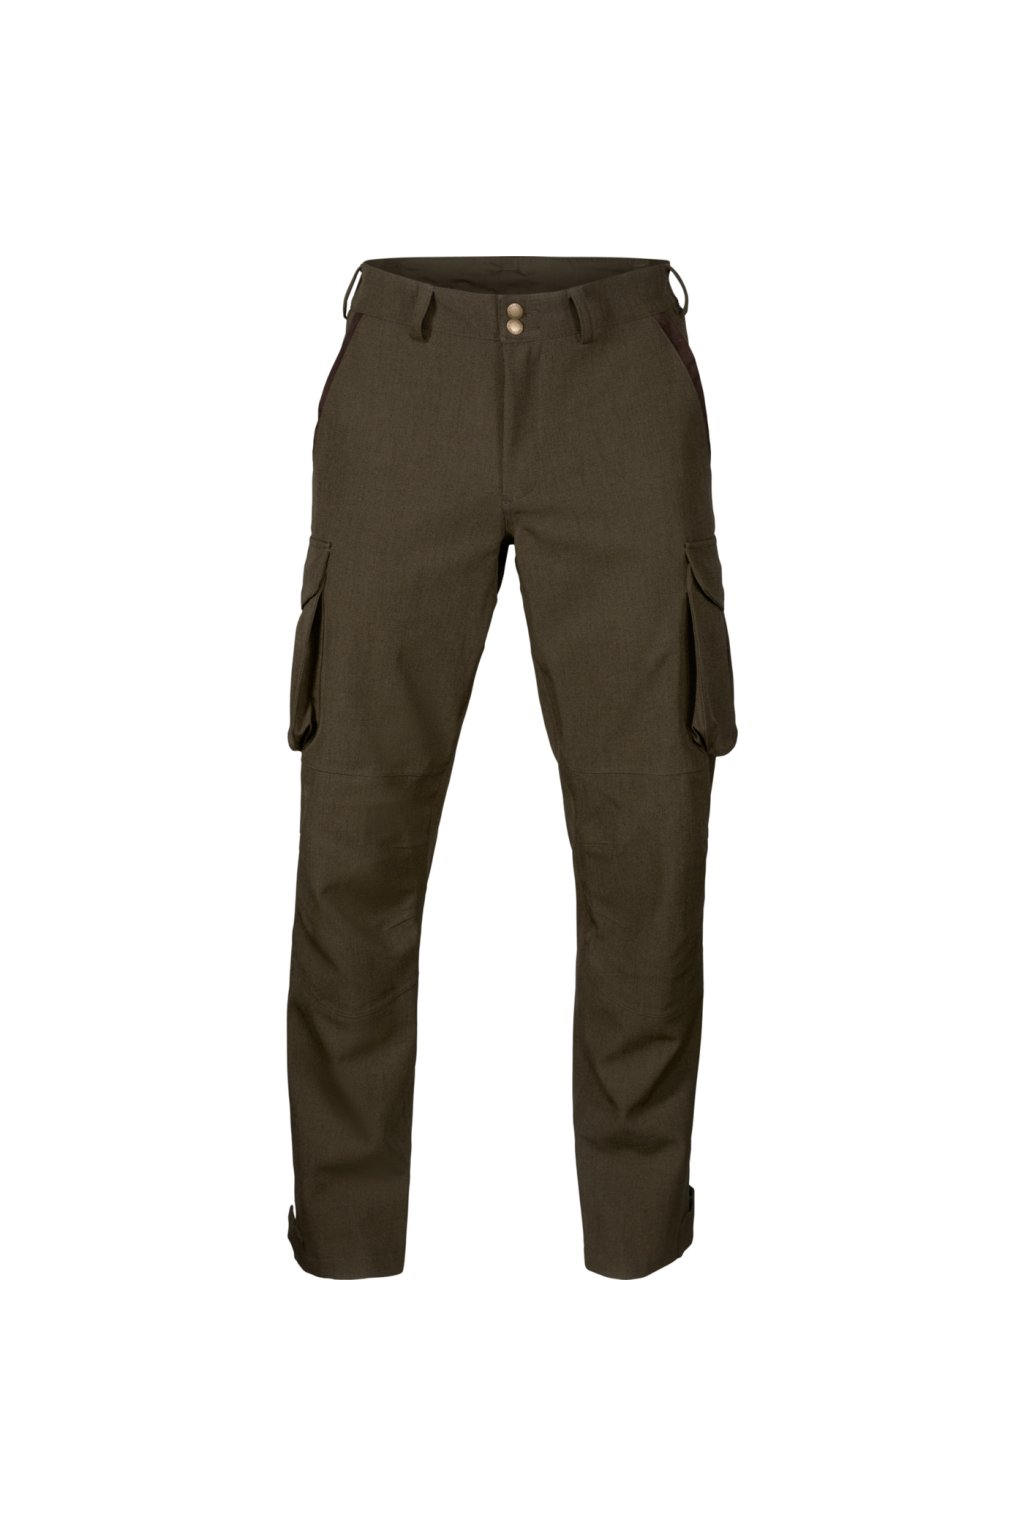 Seeland - Woodcock Advanced kalhoty pánské NOVINKA 2020